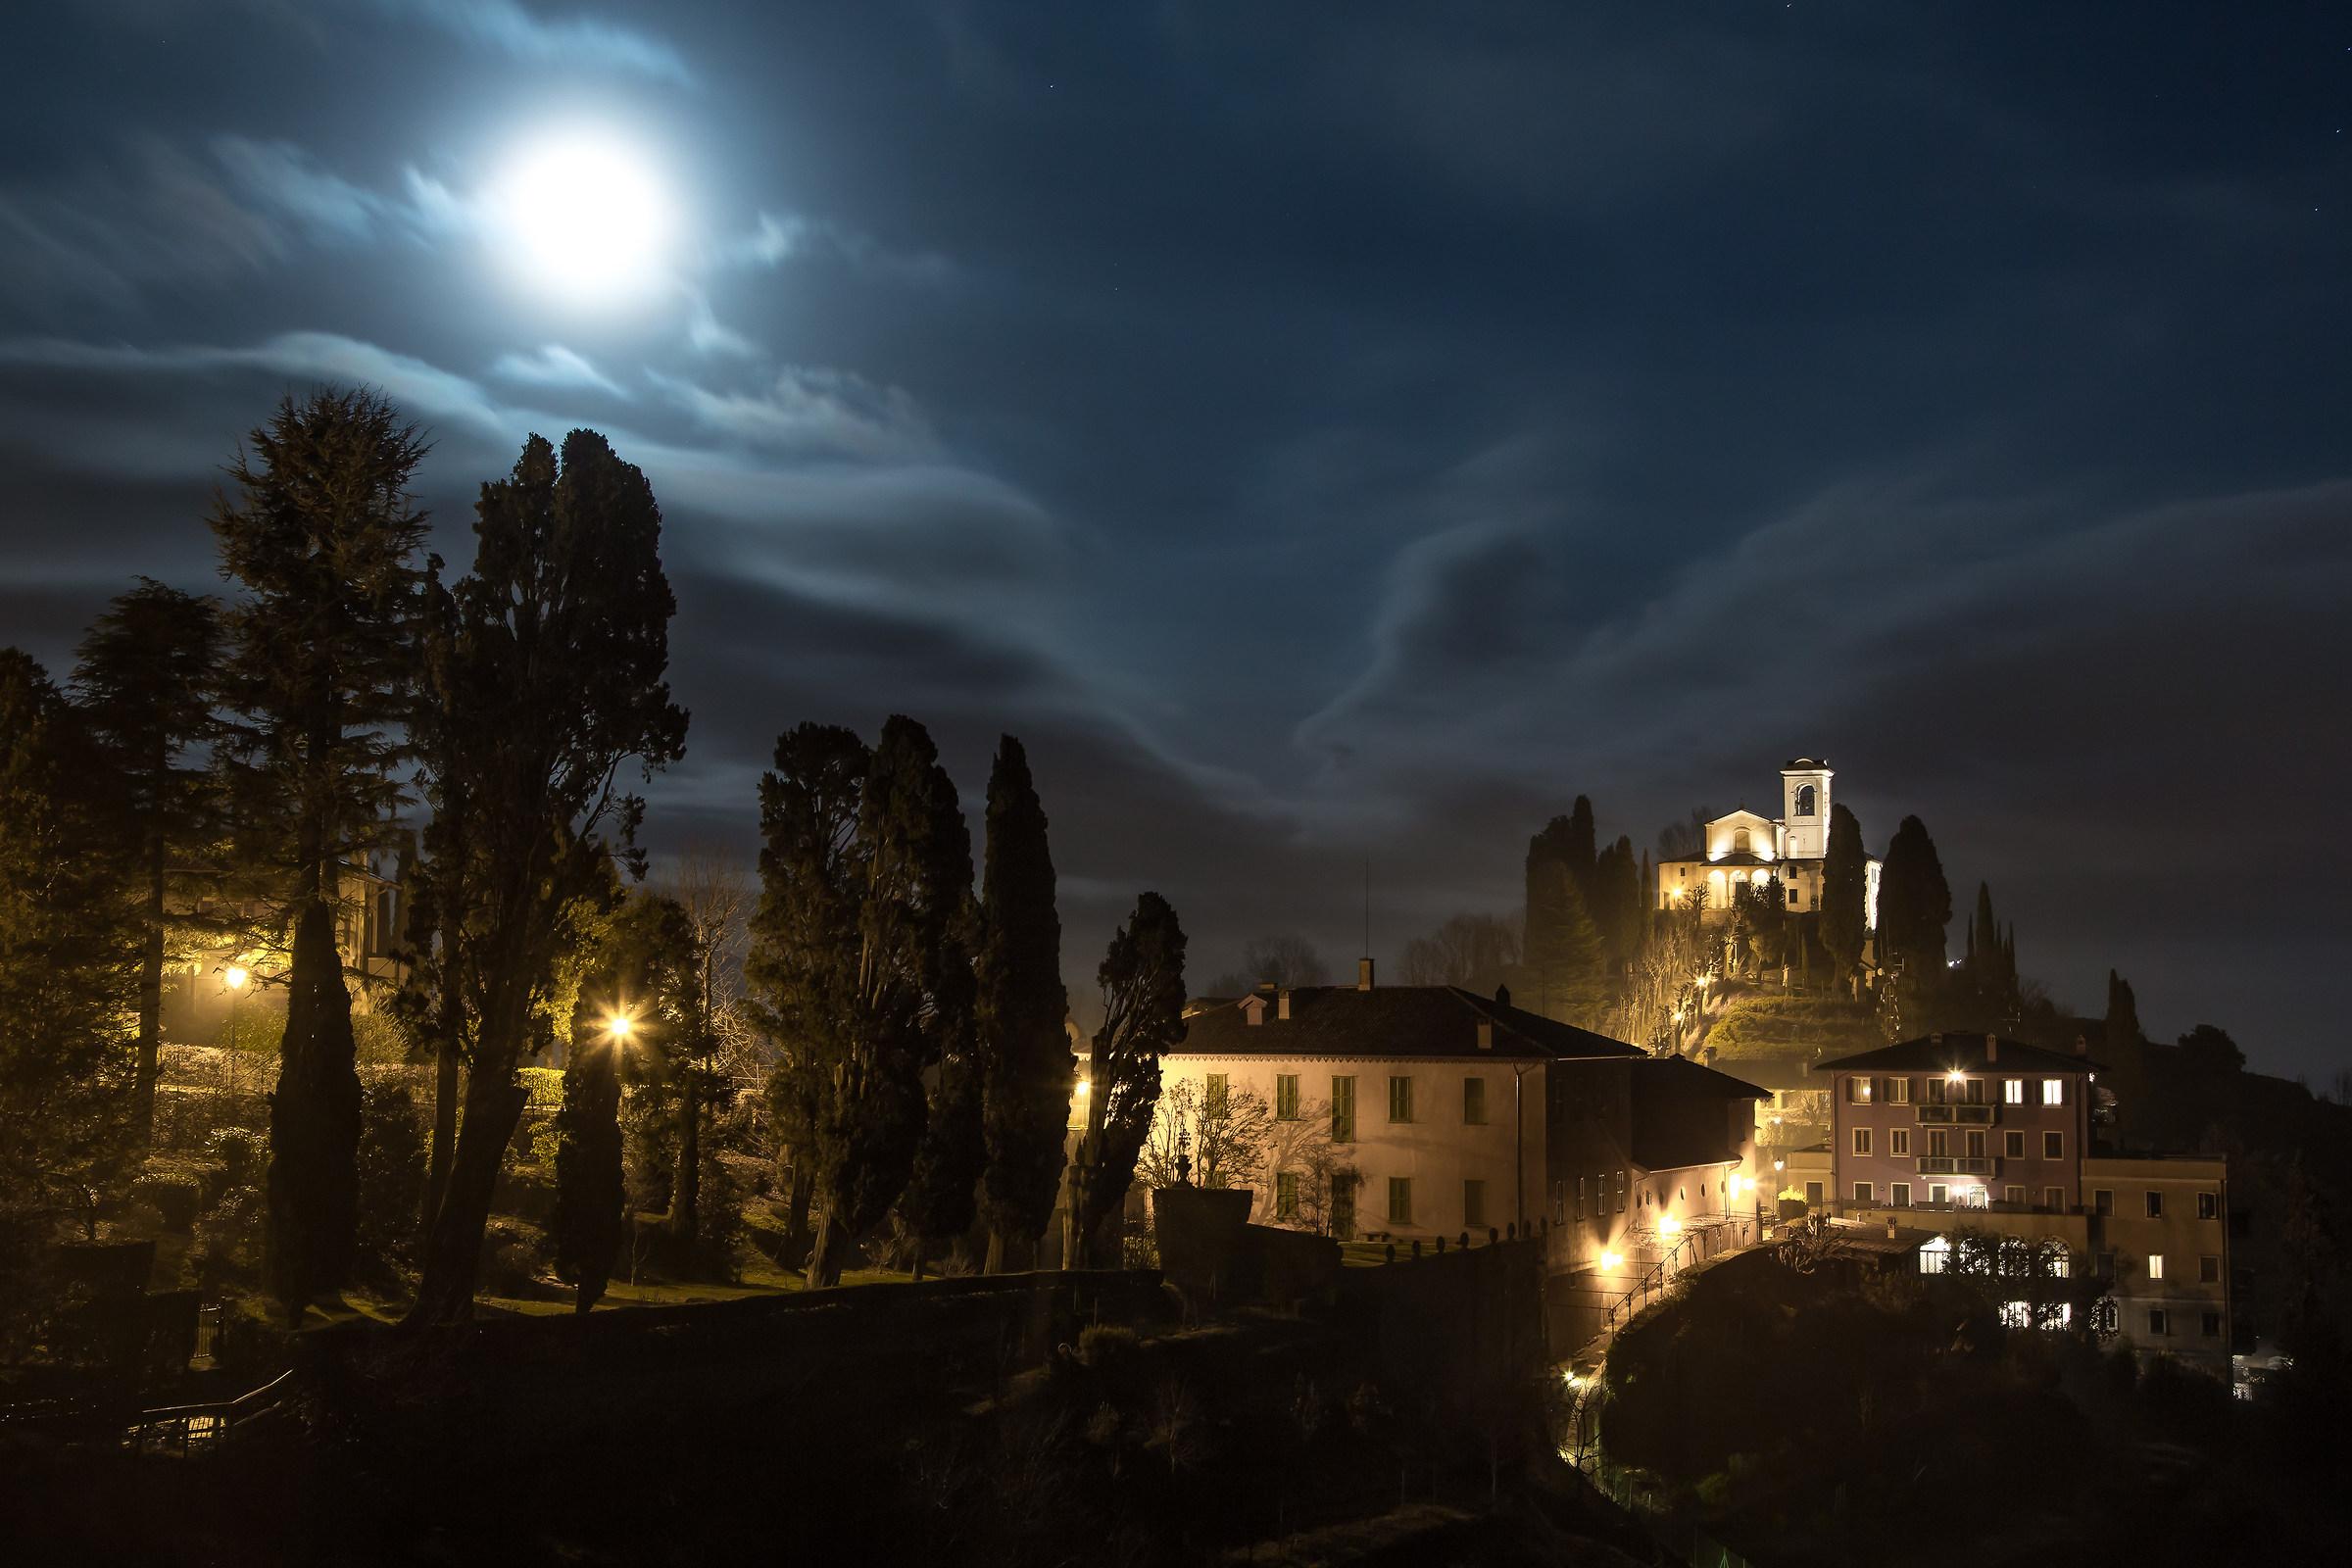 Magical night....